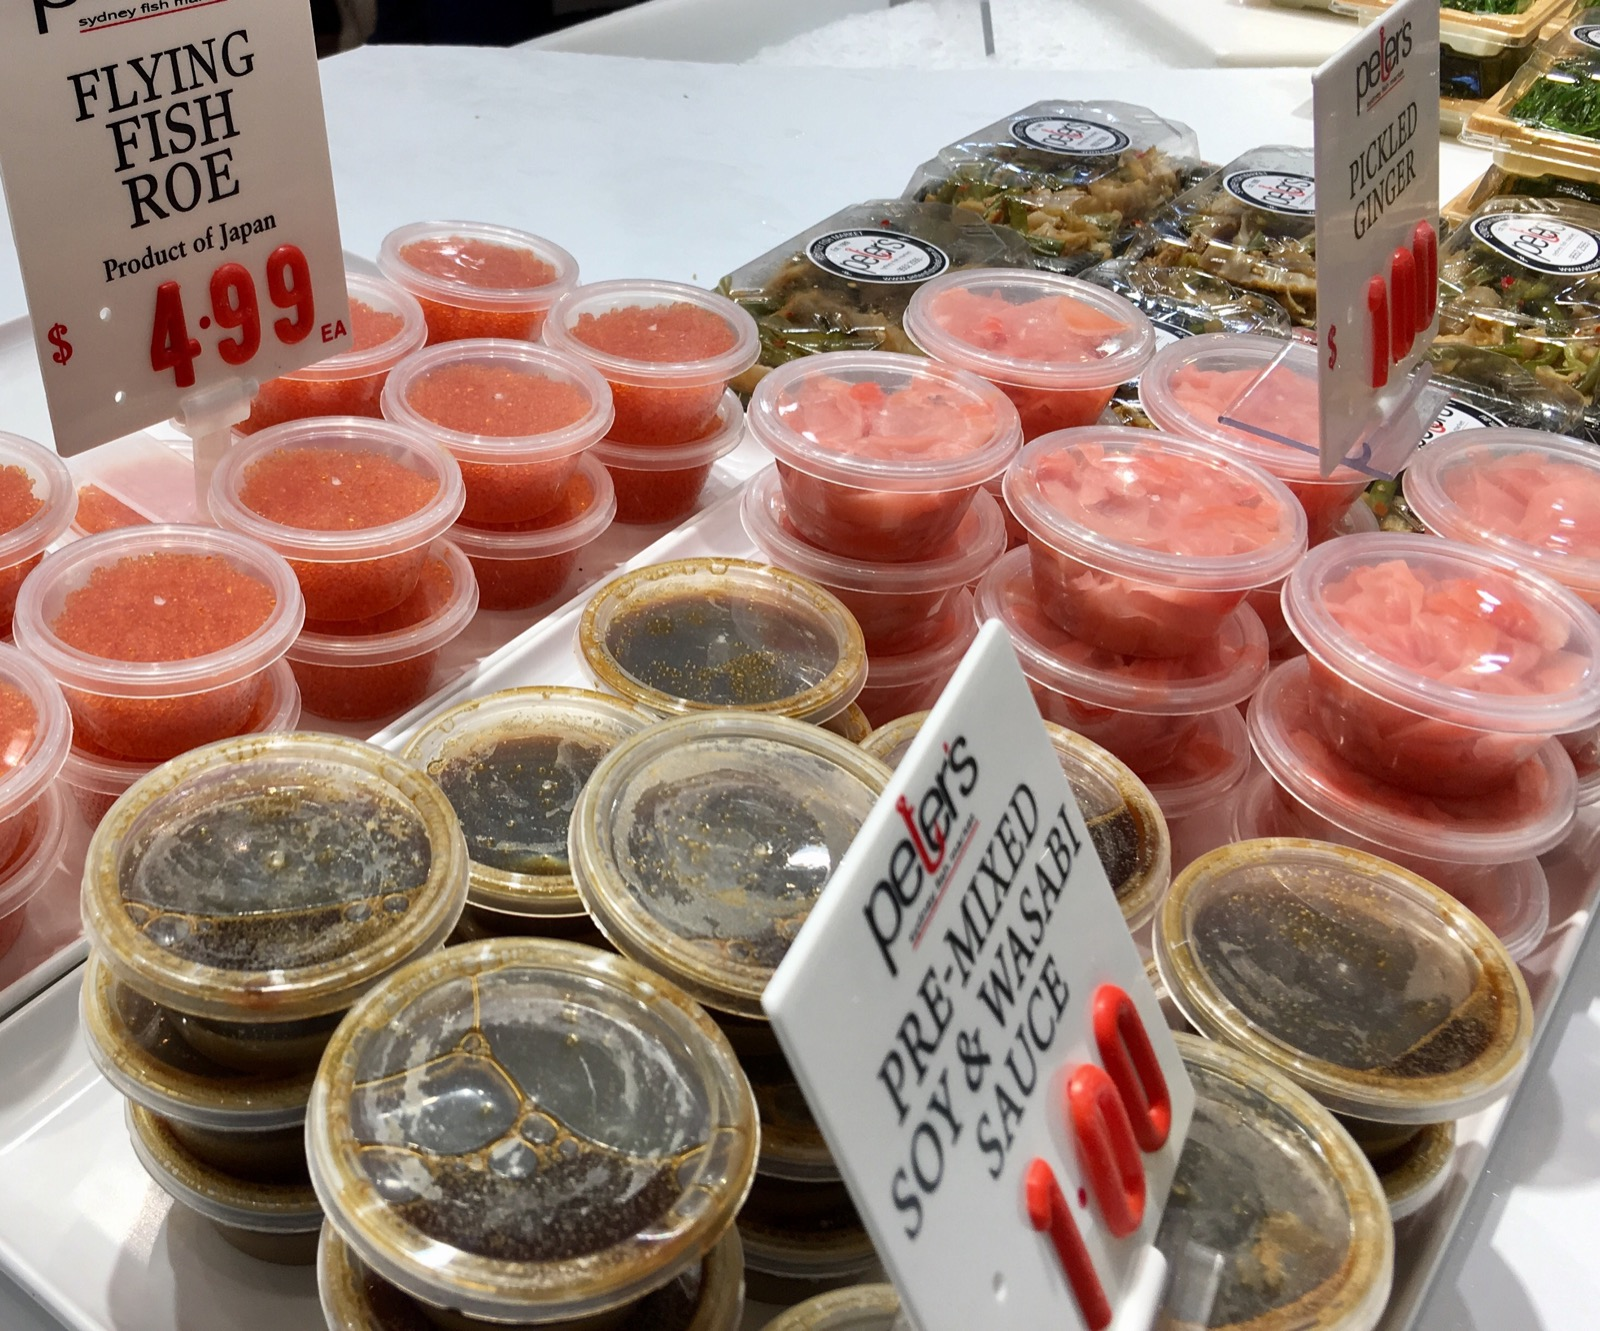 sydney-fish-market_flying-fish-roe